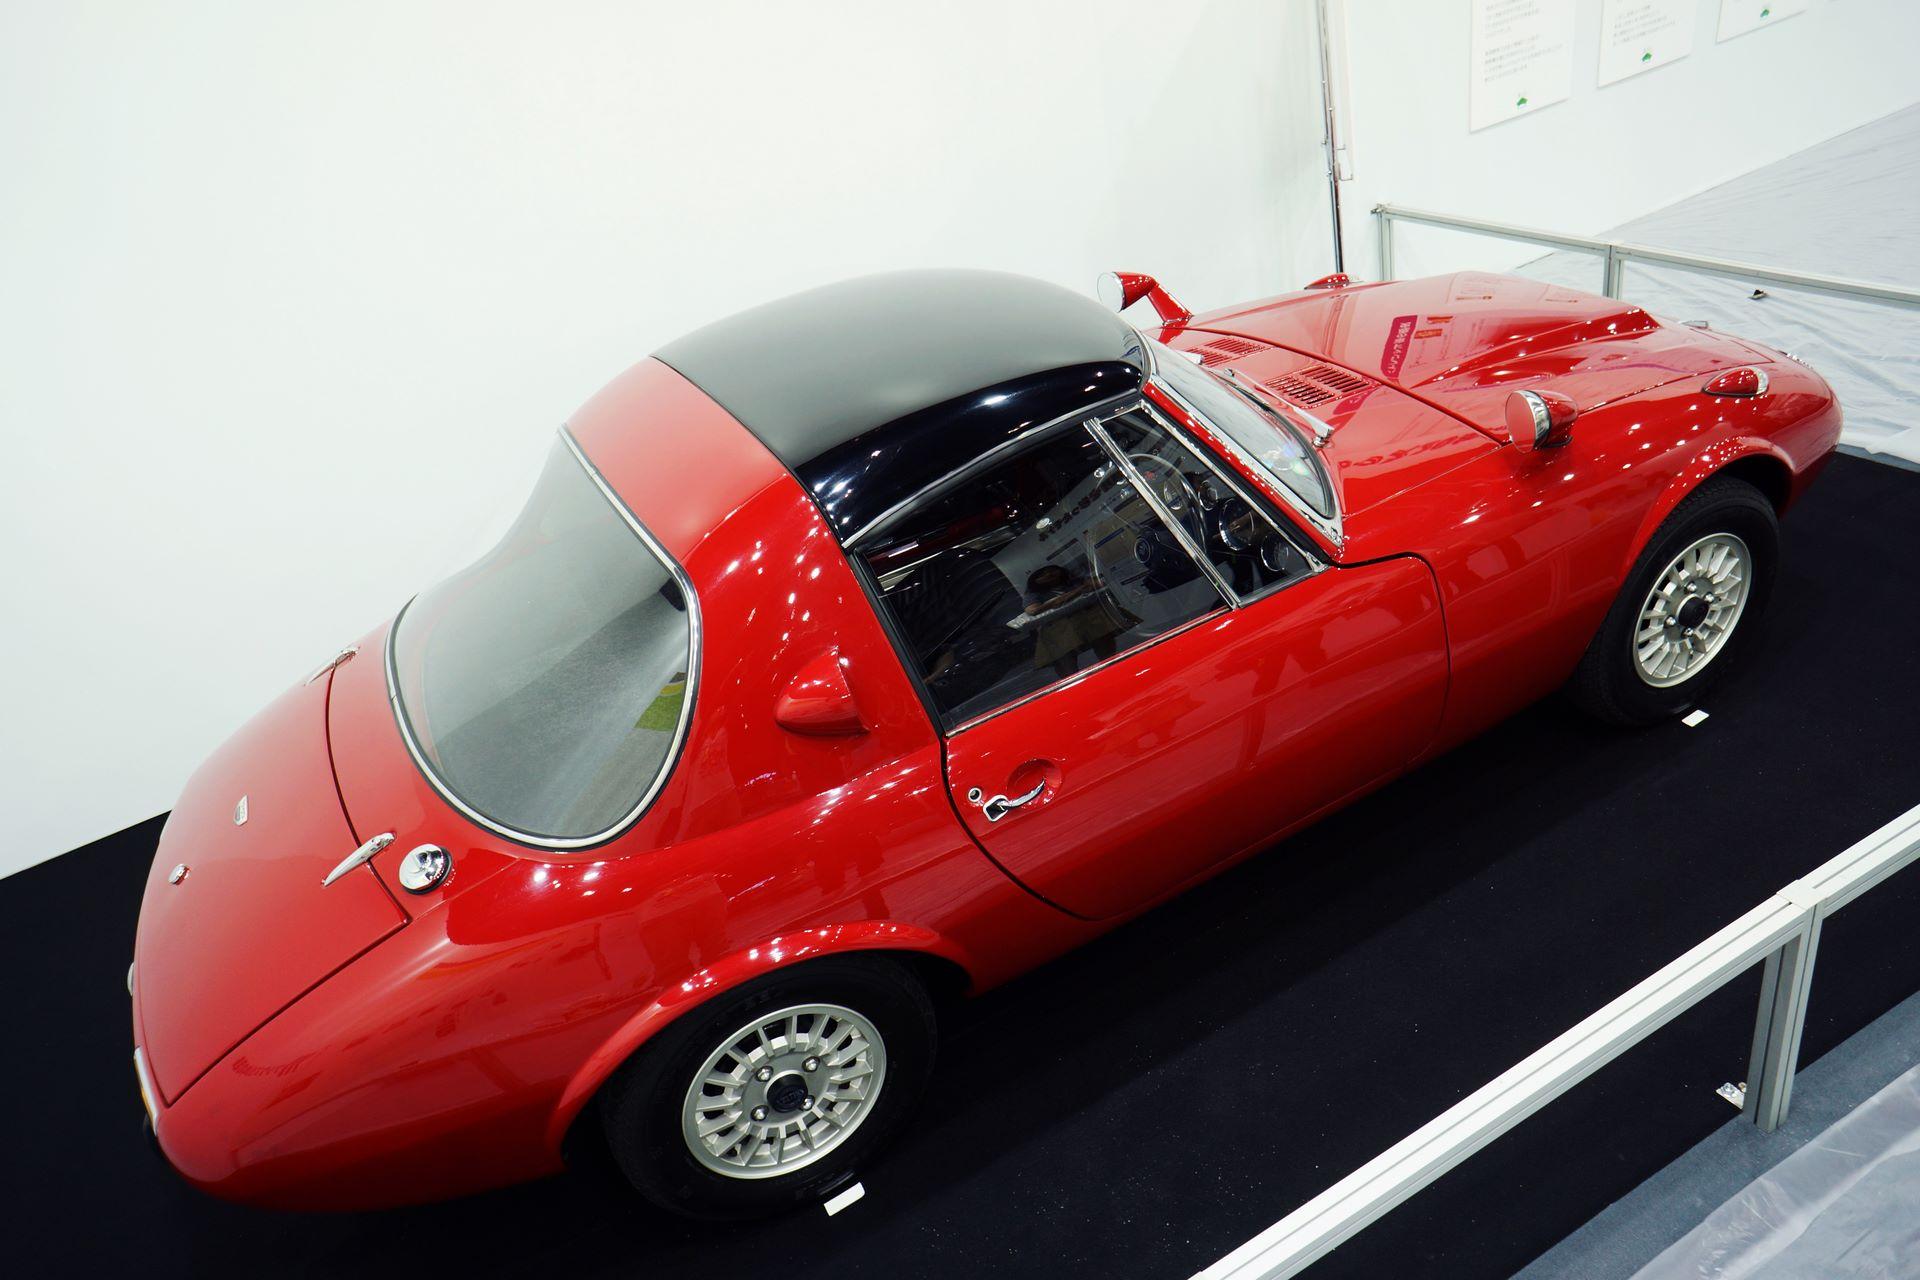 Toyota-Sports-800-Gas-Turbine-Hybrid-concept-1977-6